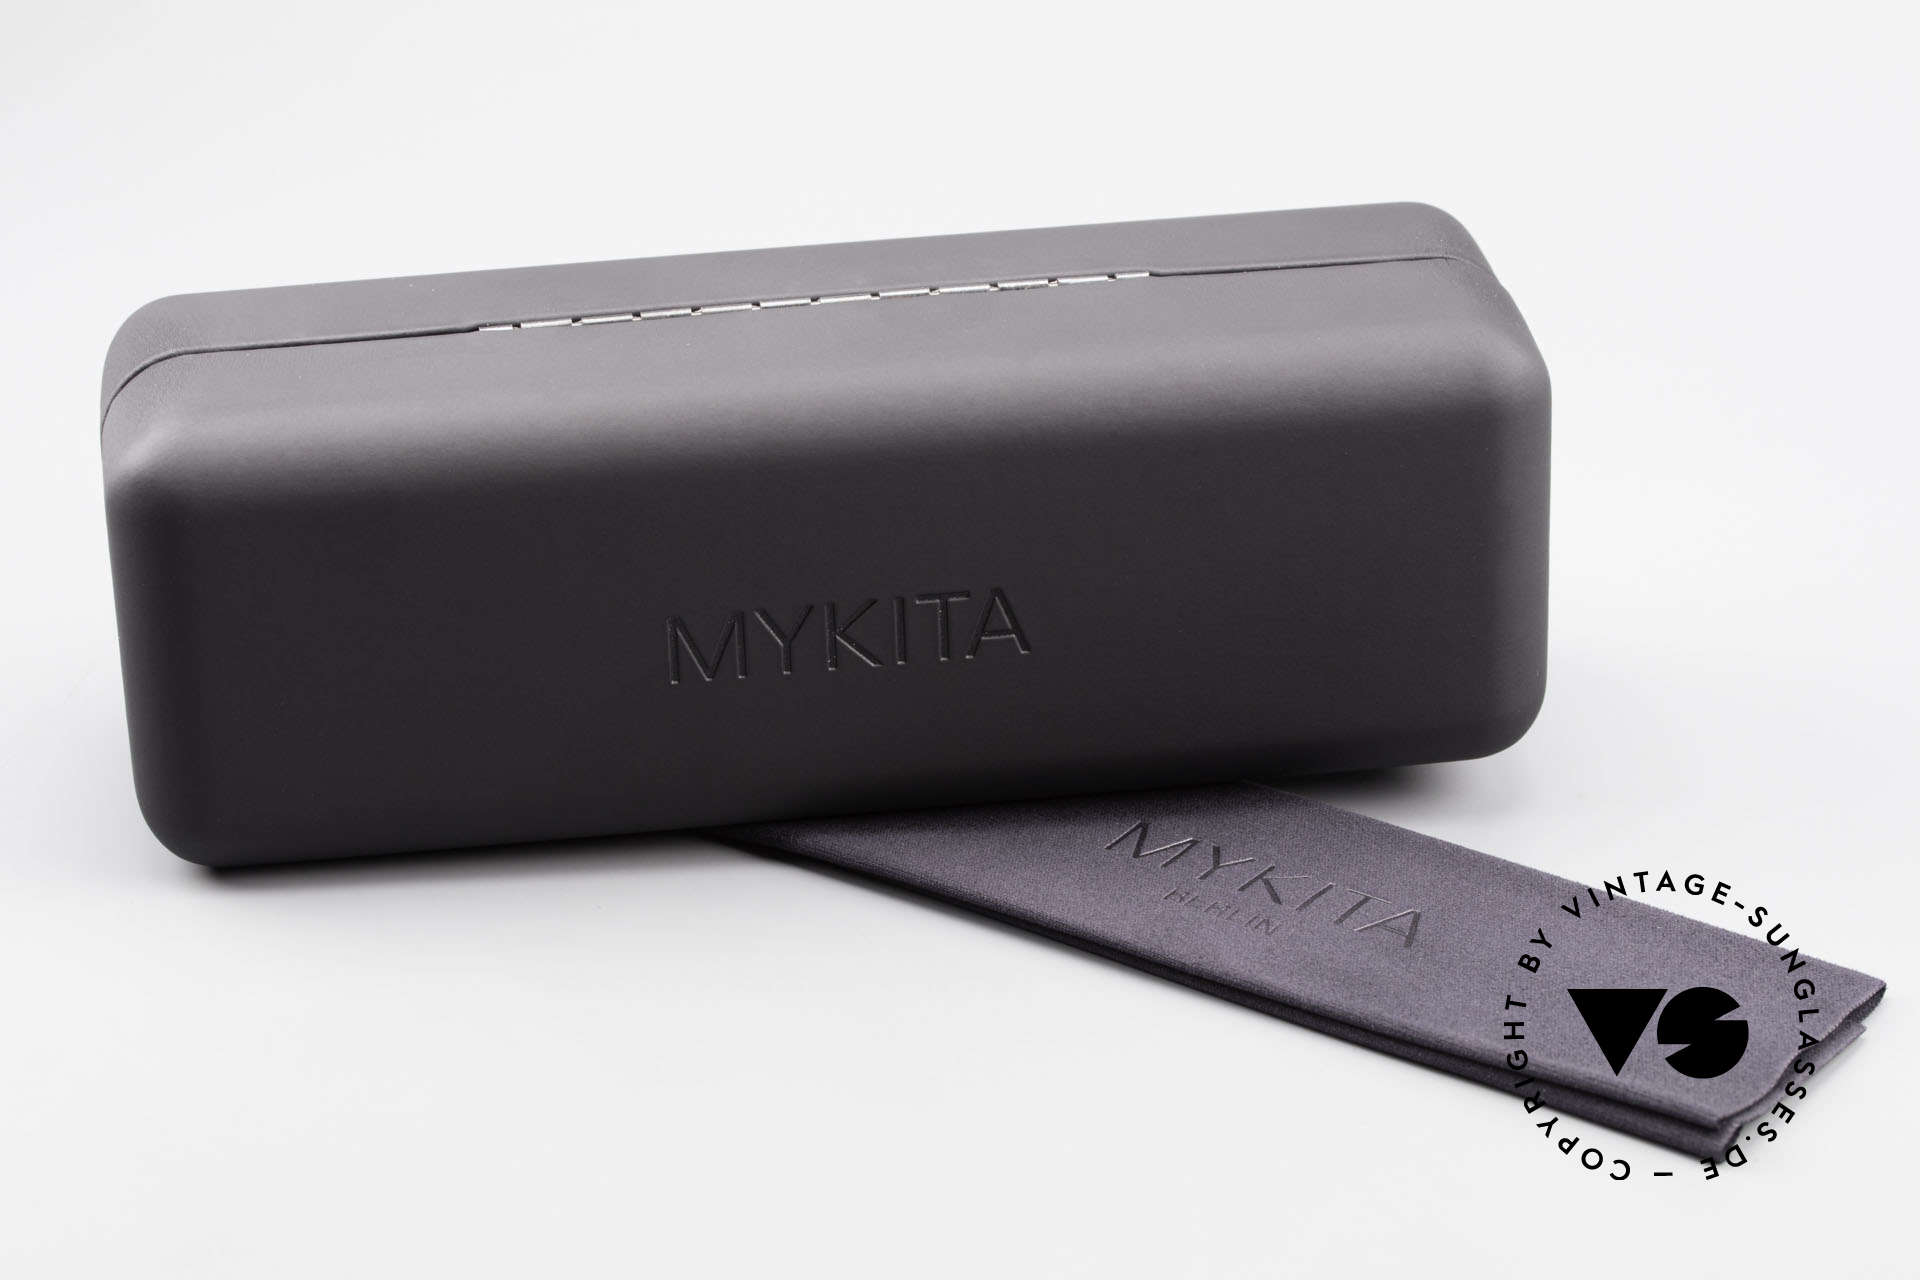 Mykita Jon Lite Metal Designer Sunglasses, Size: medium, Made for Men and Women